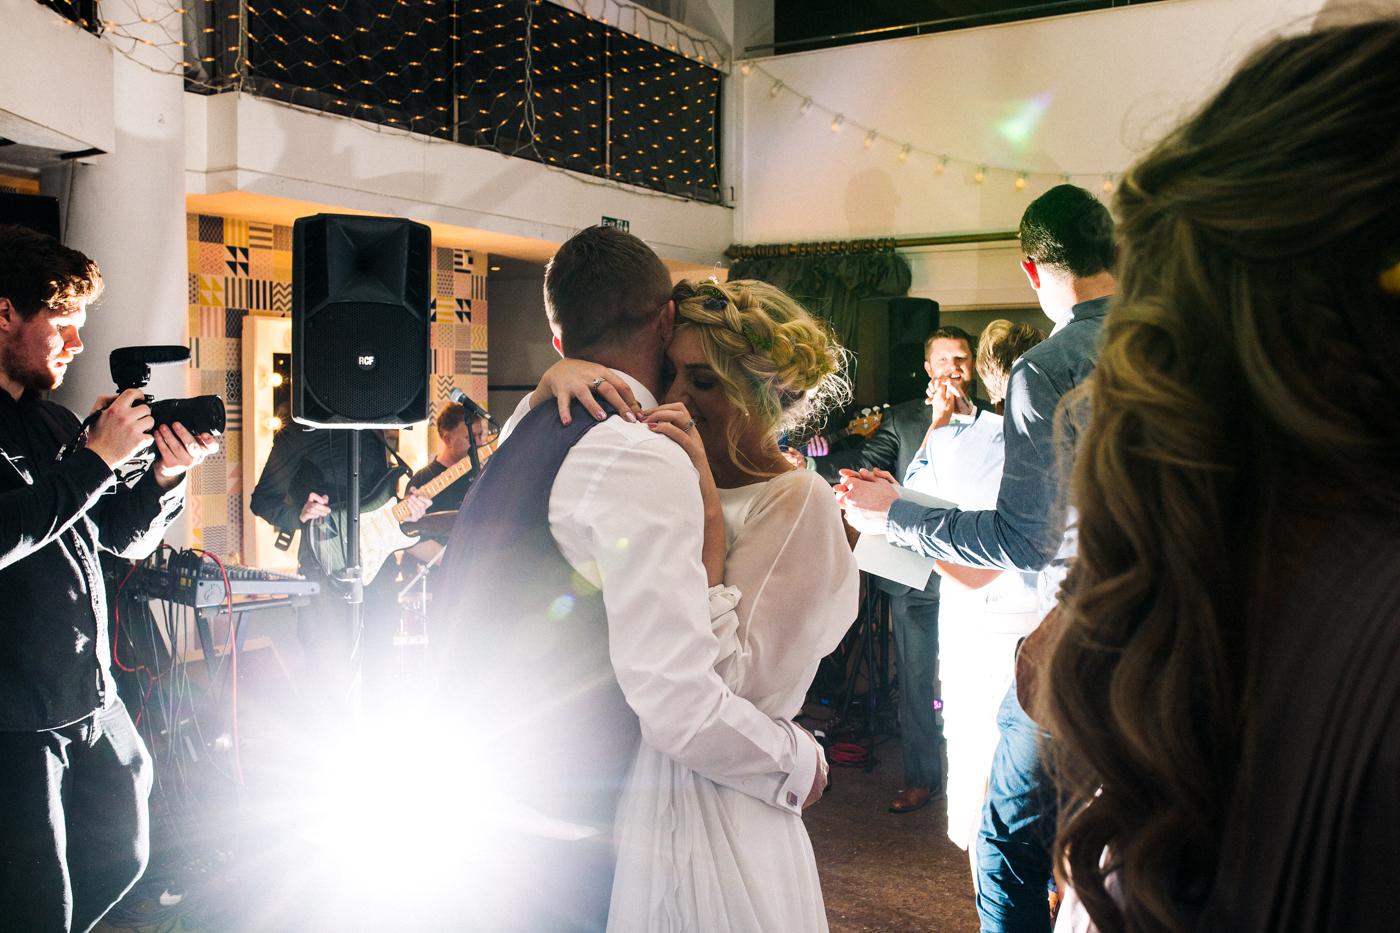 teesside-middlesbrough-north-east-wedding-photographer-creative-wedding-venues-0032.jpg